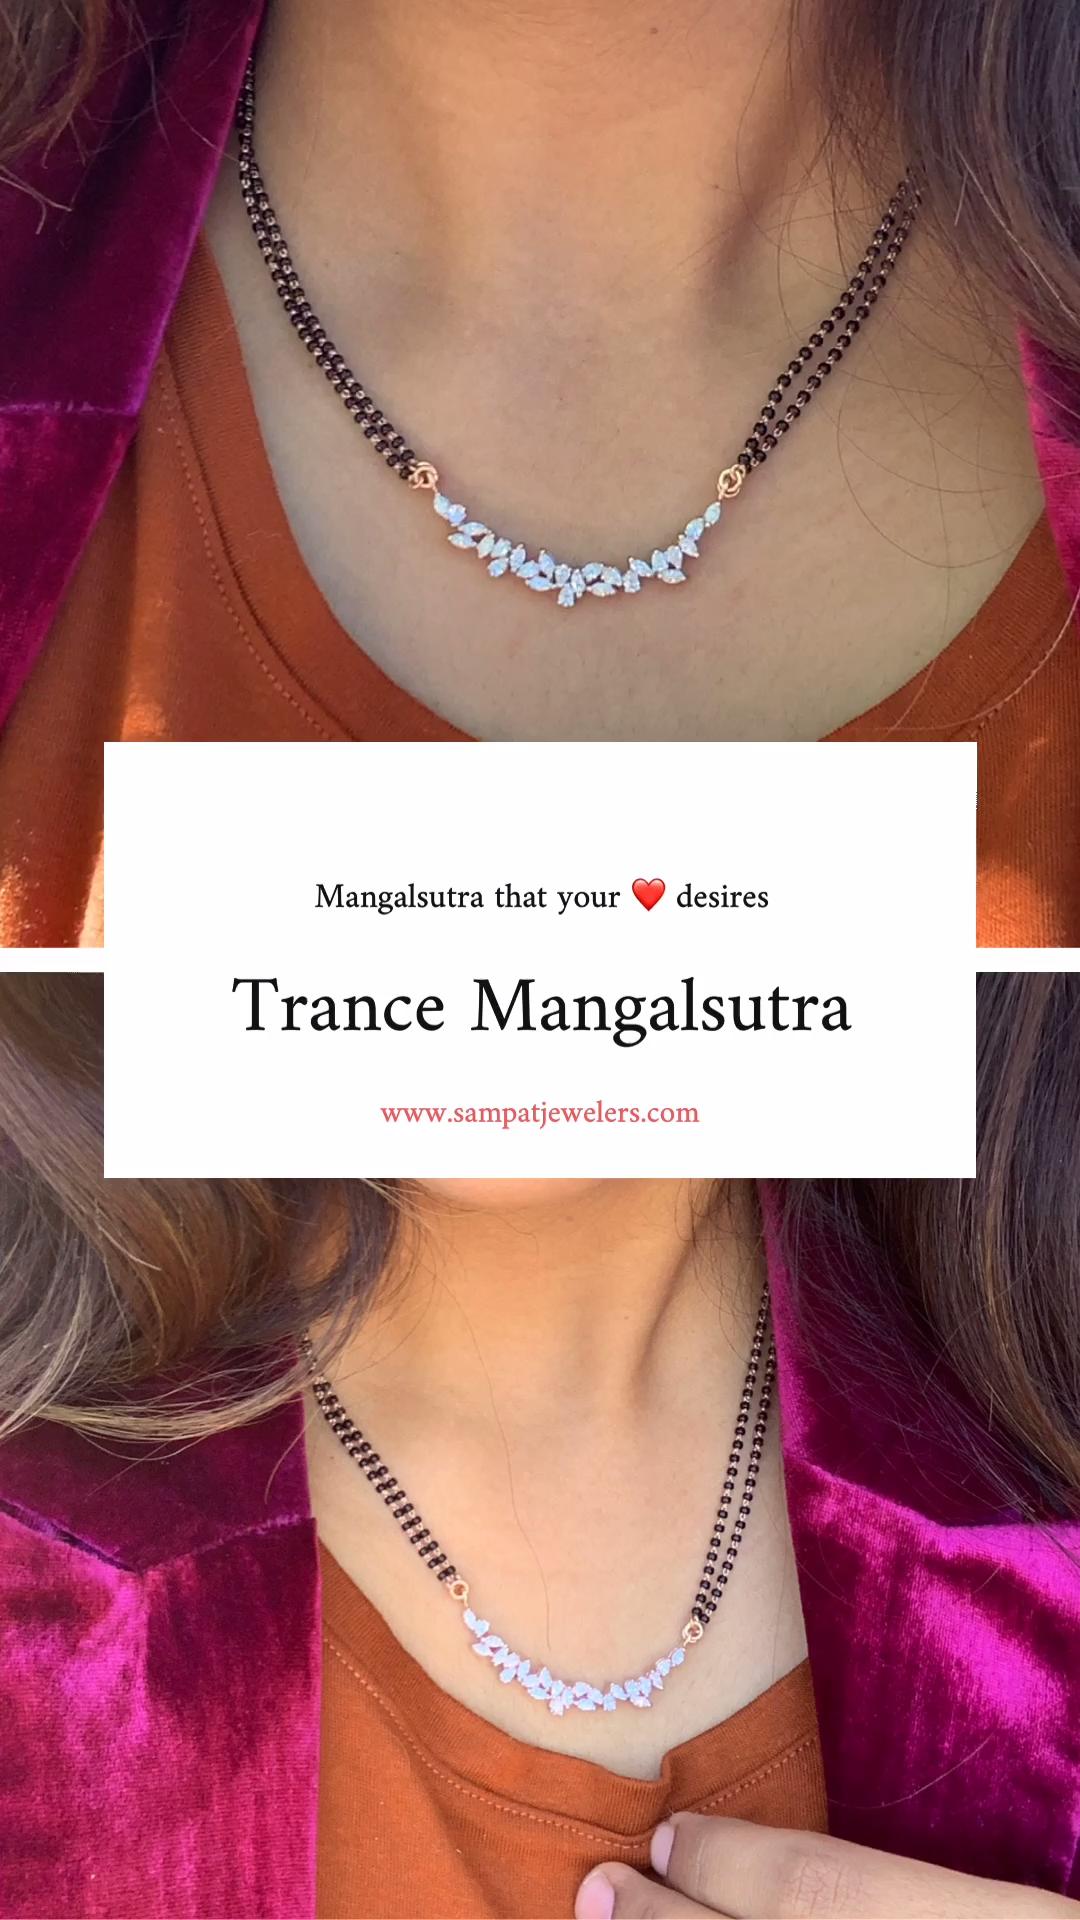 Trance Mangalsutra